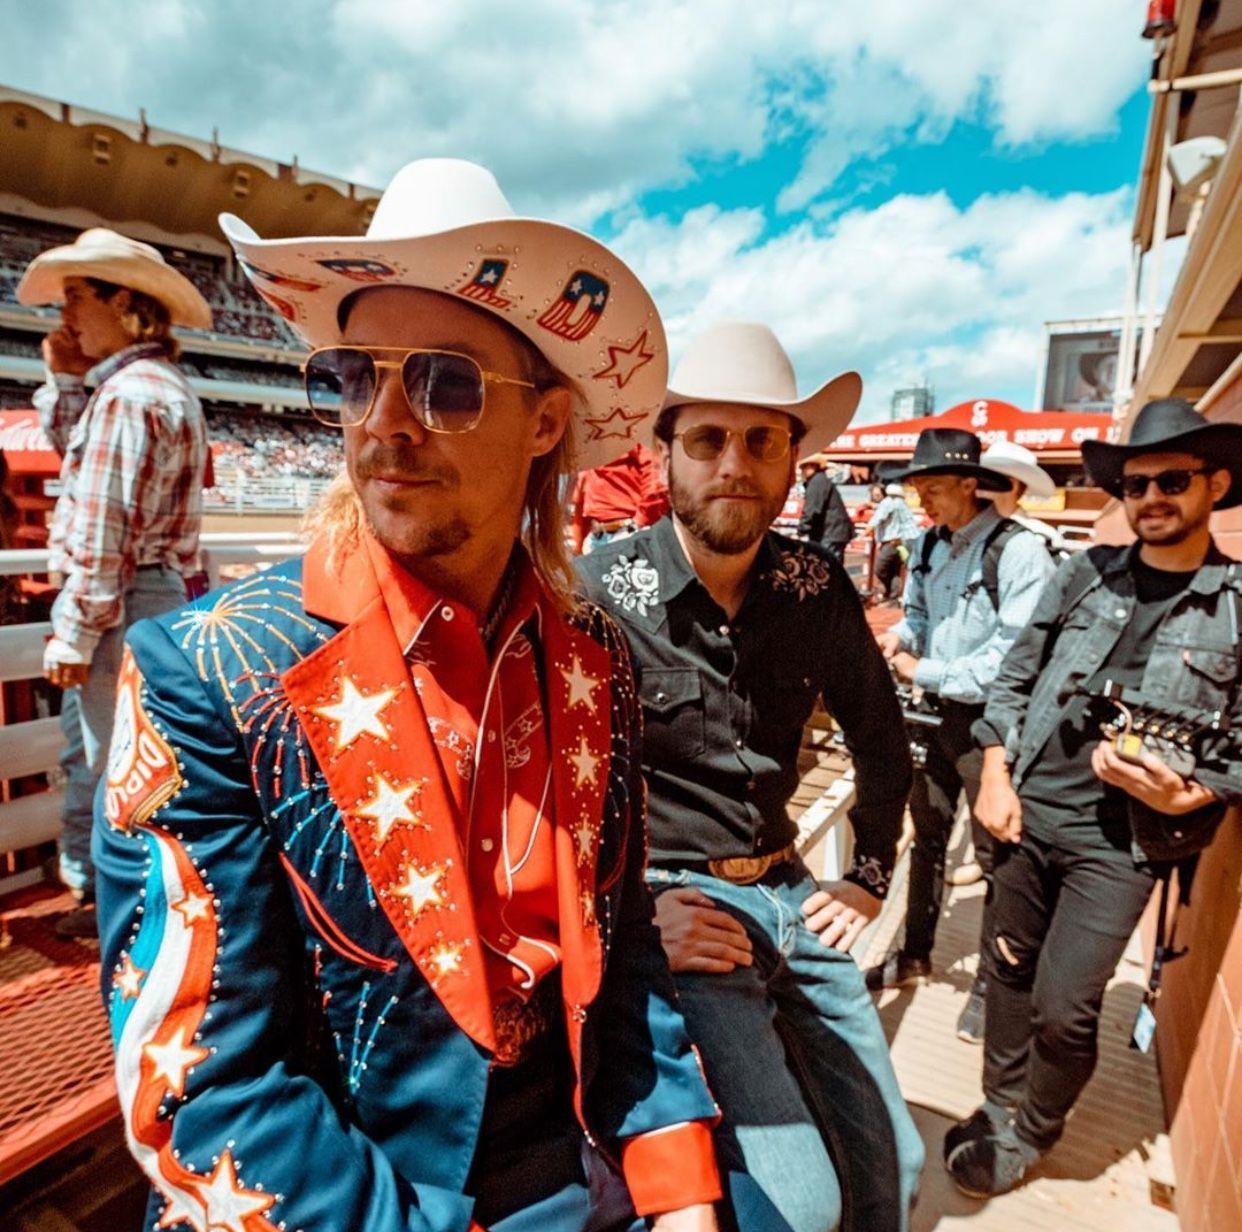 Cr brandondermer Diplo, Cowboy hats, Cowboy